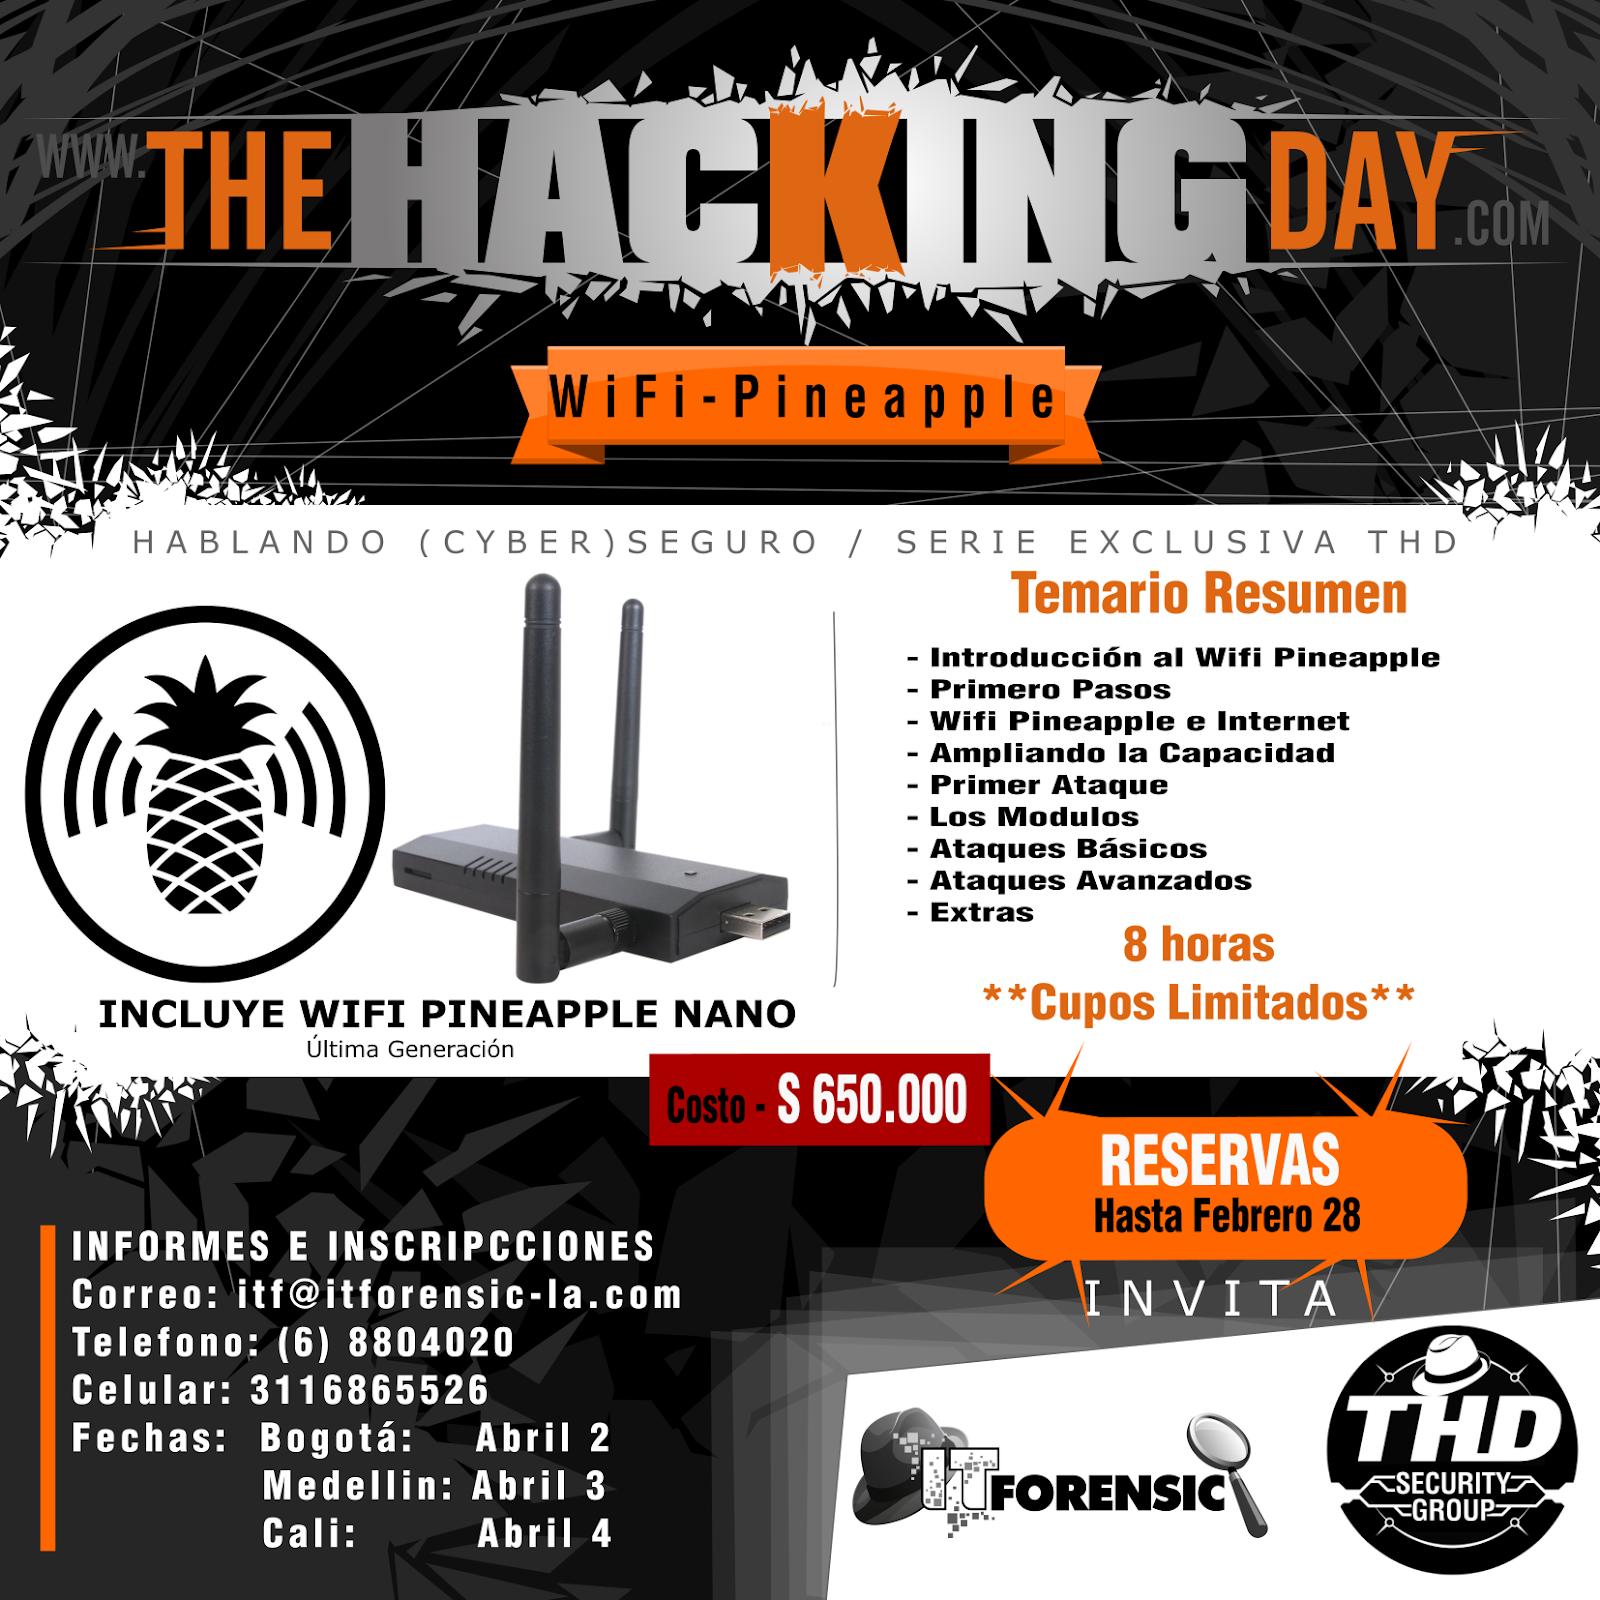 THE HACKING DAY BLOG: WIFI PINEAPPLE - LO NUEVO